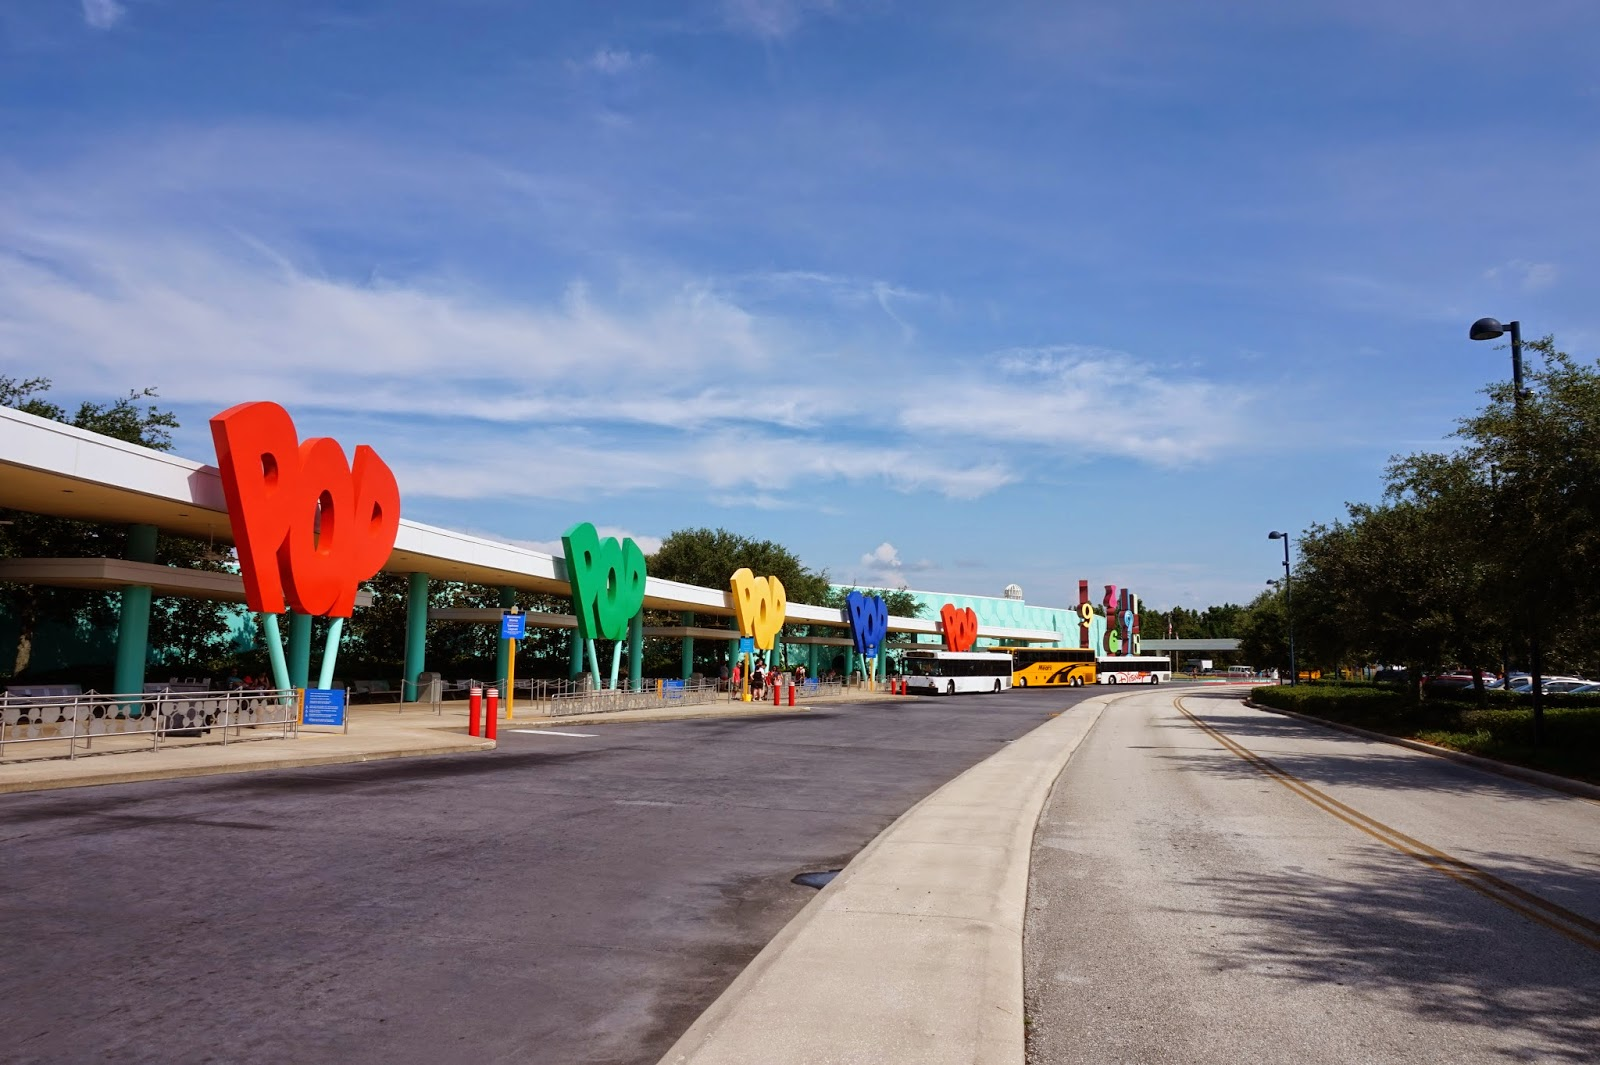 Walt Disney World's Pop Century Hotel: A Review